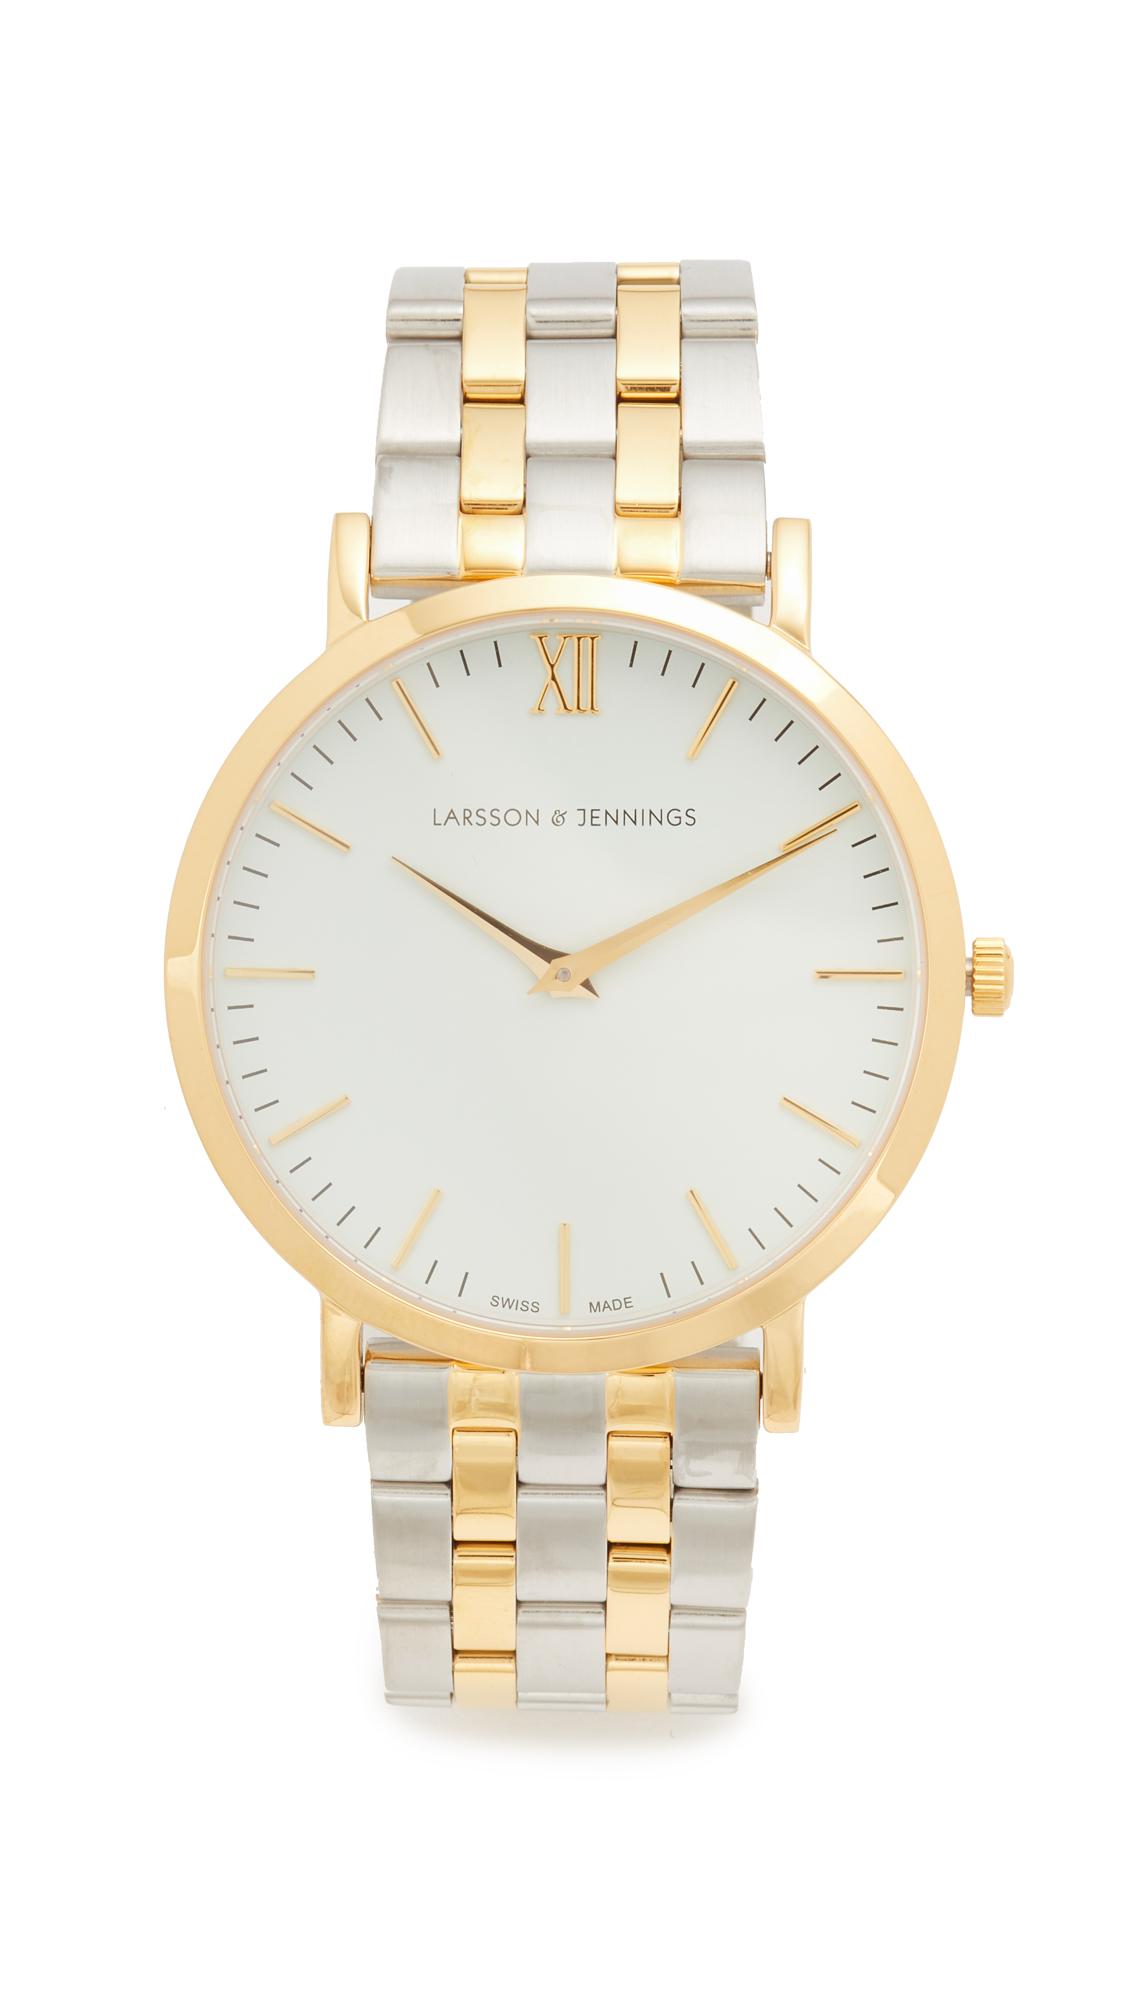 Larsson & Jennings Lugano 5 Link Watch - Gold/White/Silver